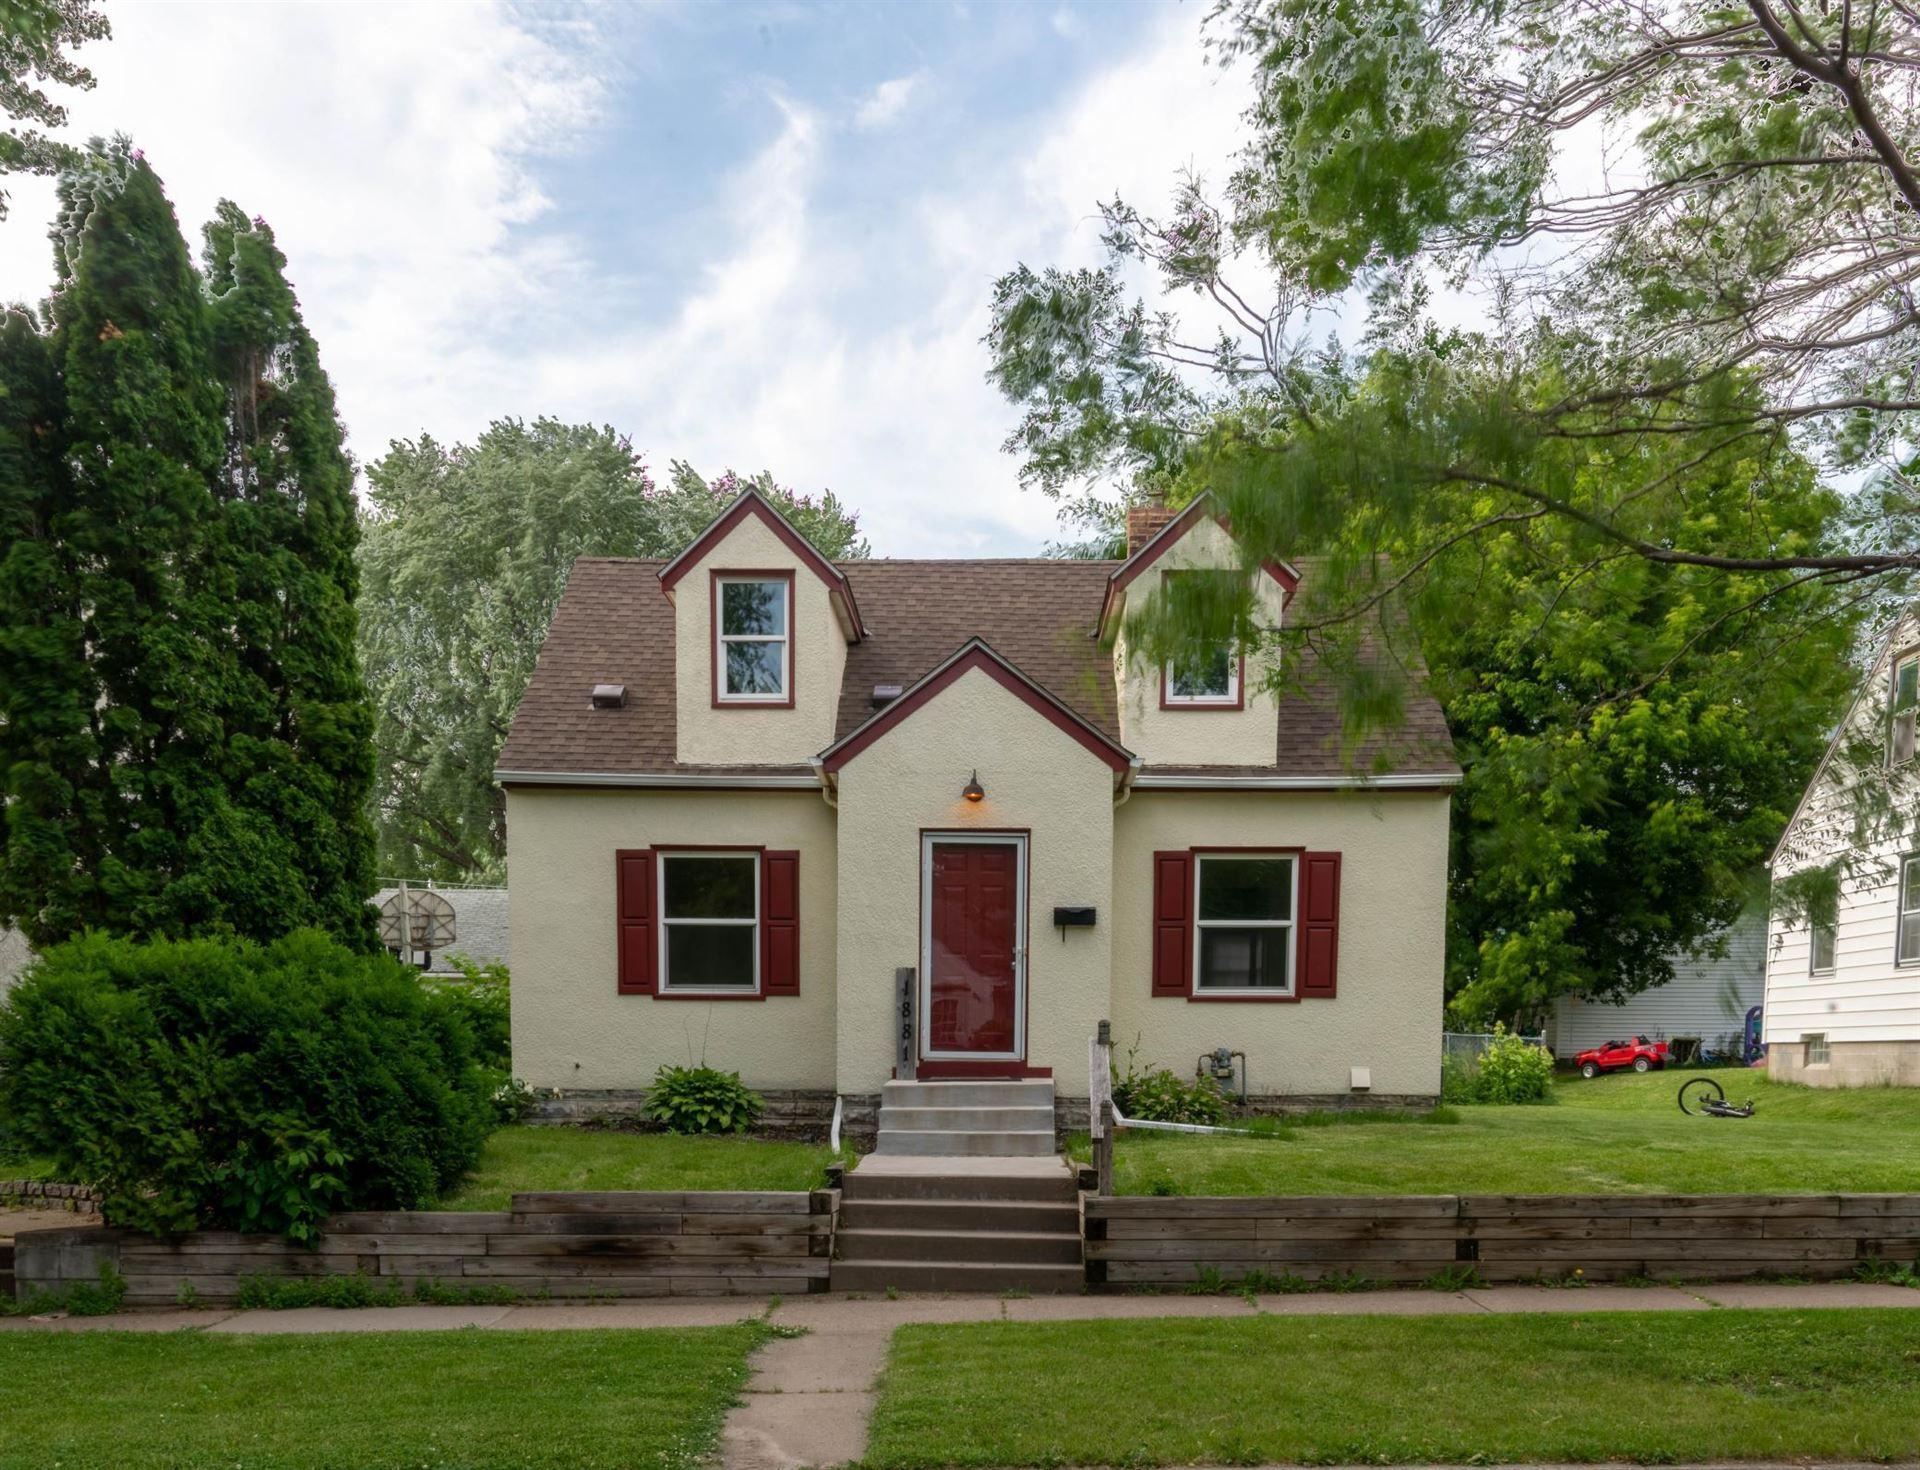 1881 Orange Avenue E, Saint Paul, MN 55119 - MLS#: 5629481